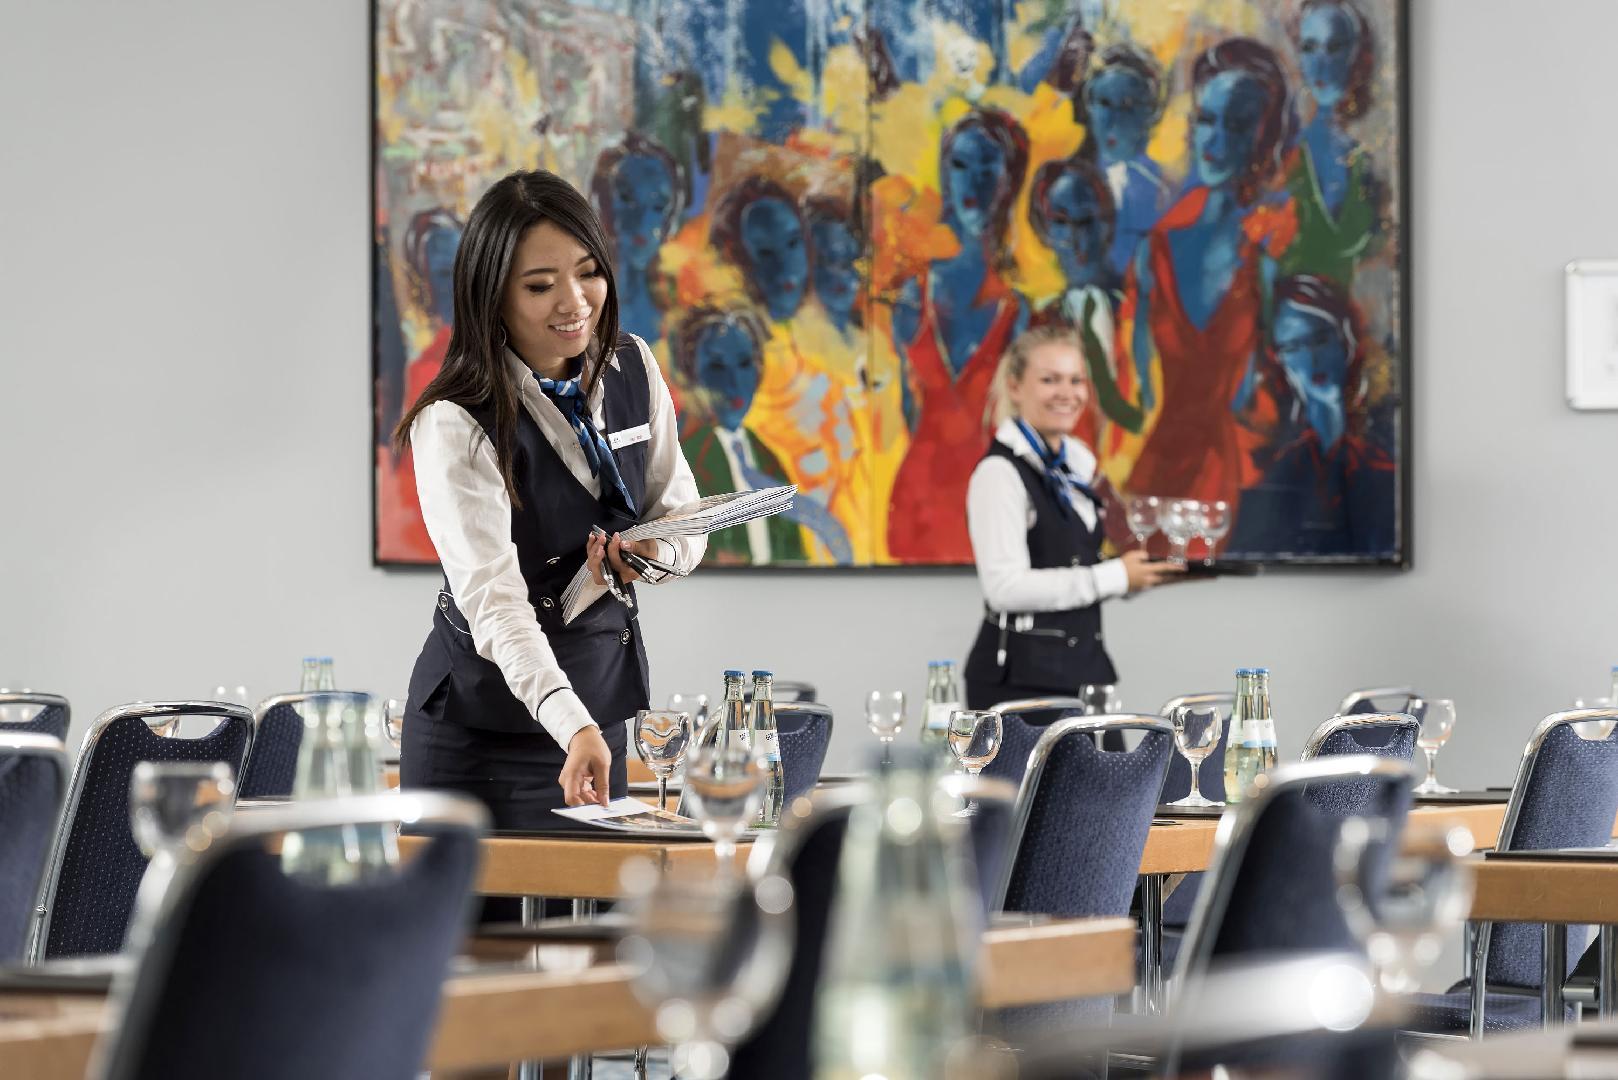 Bild 3 von Saal II im Maritim proArte Hotel Berlin